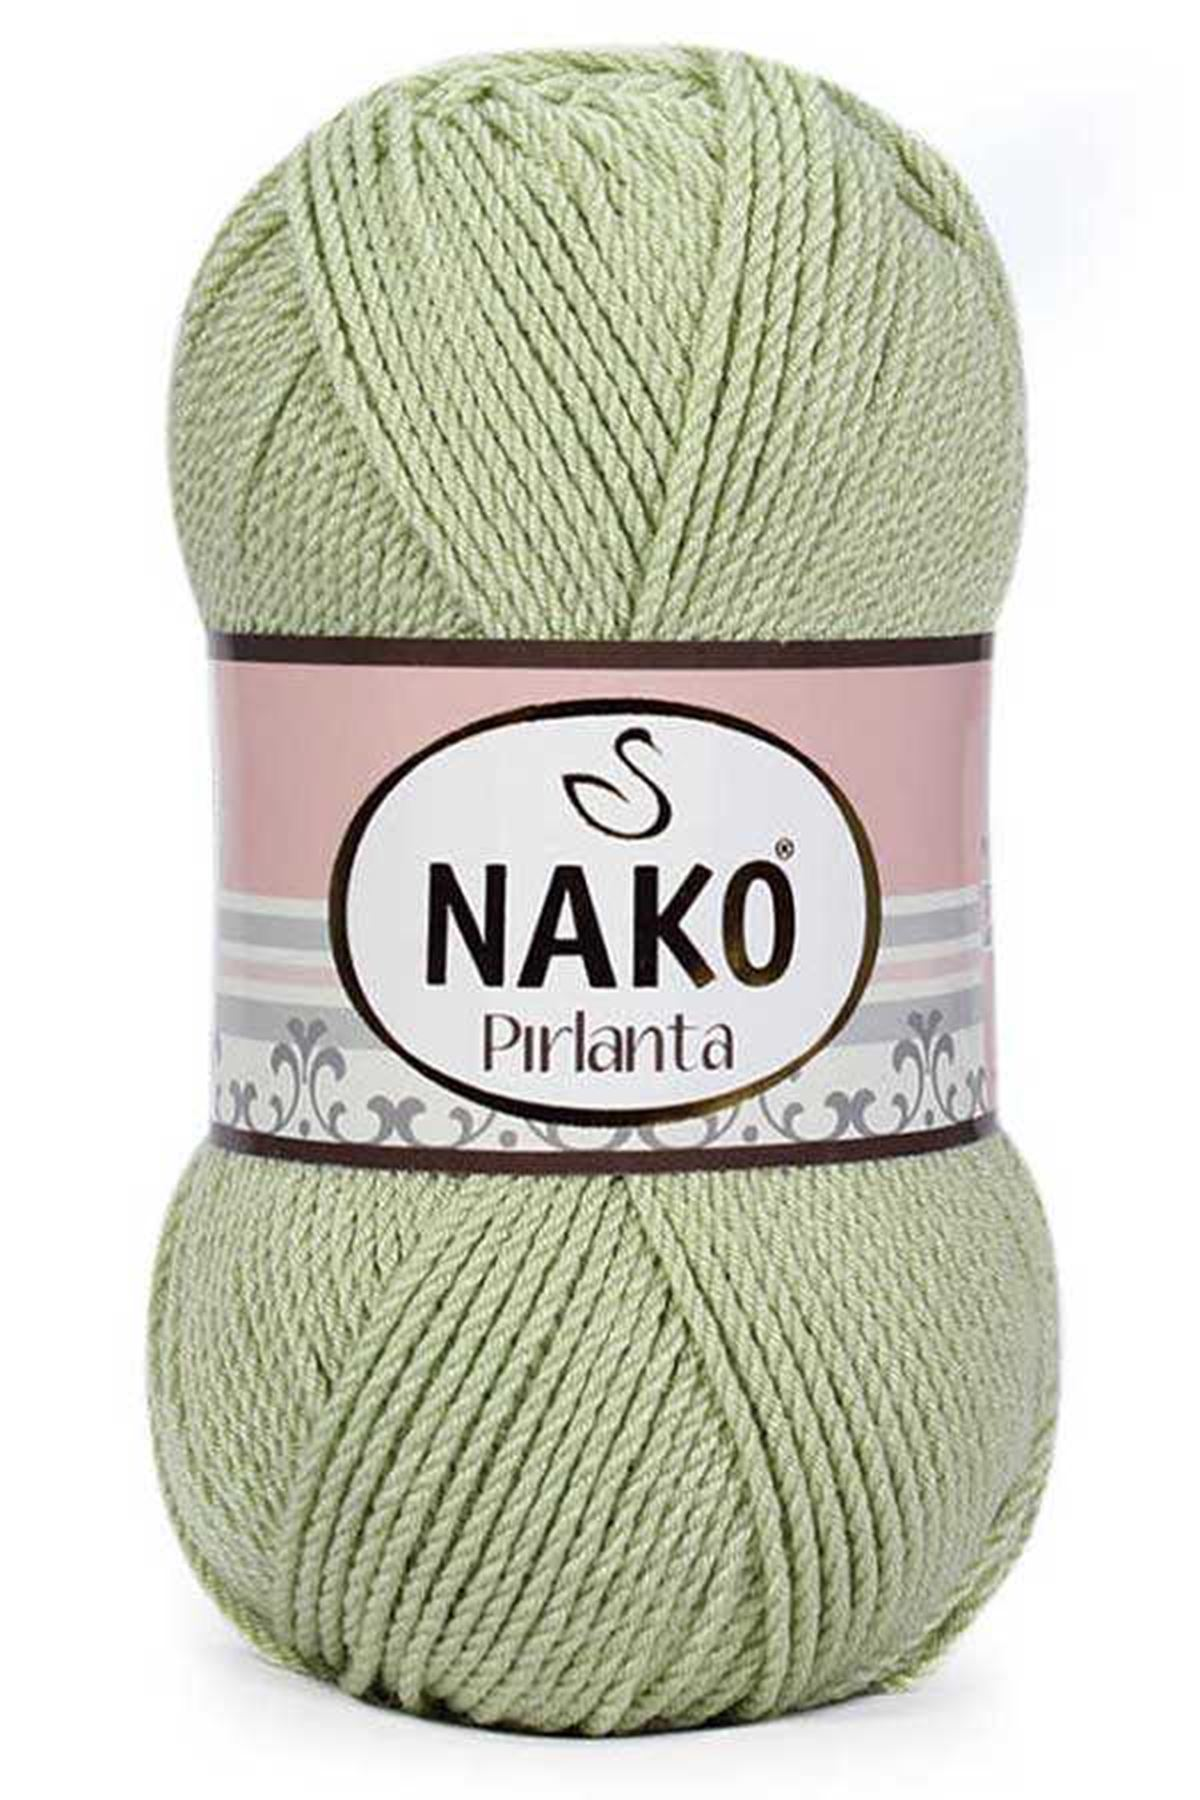 Nako Pırlanta-10492 Deniz Köpüğü